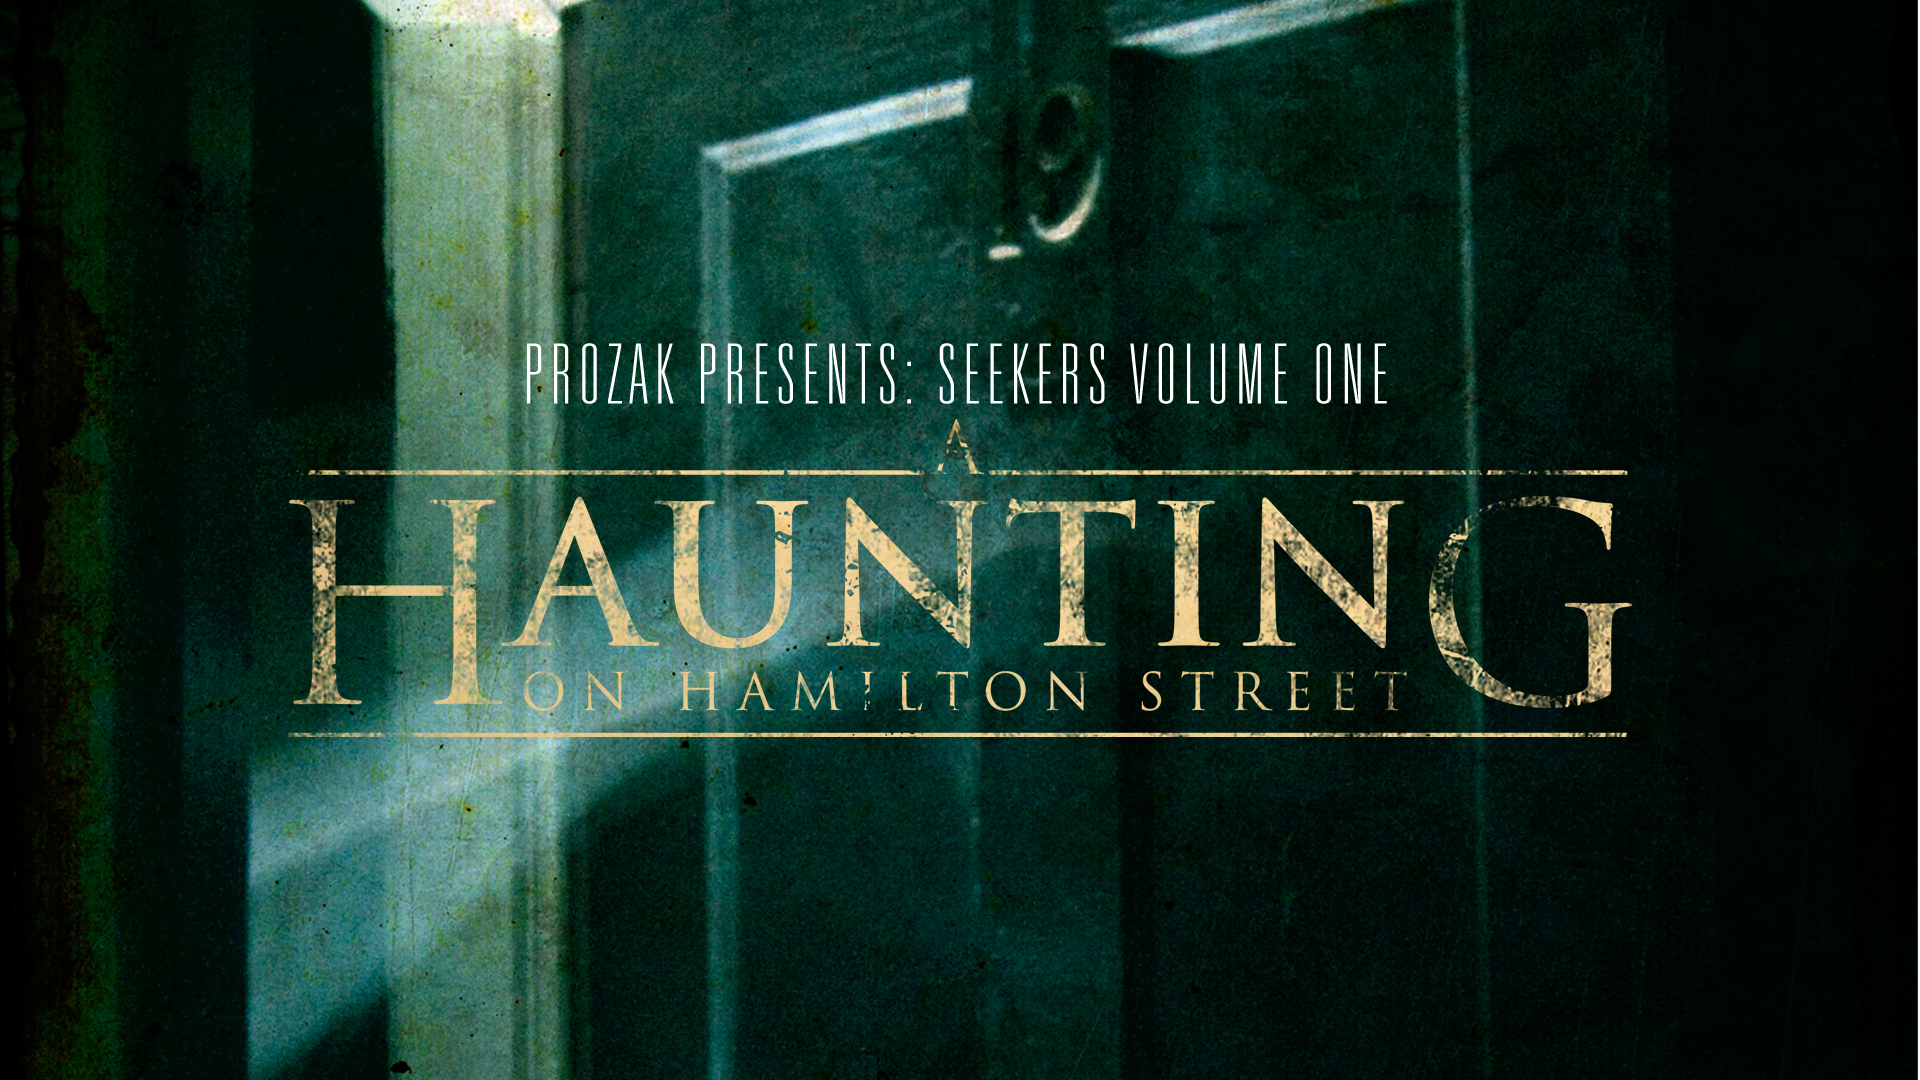 A Haunting on Hamilton Street